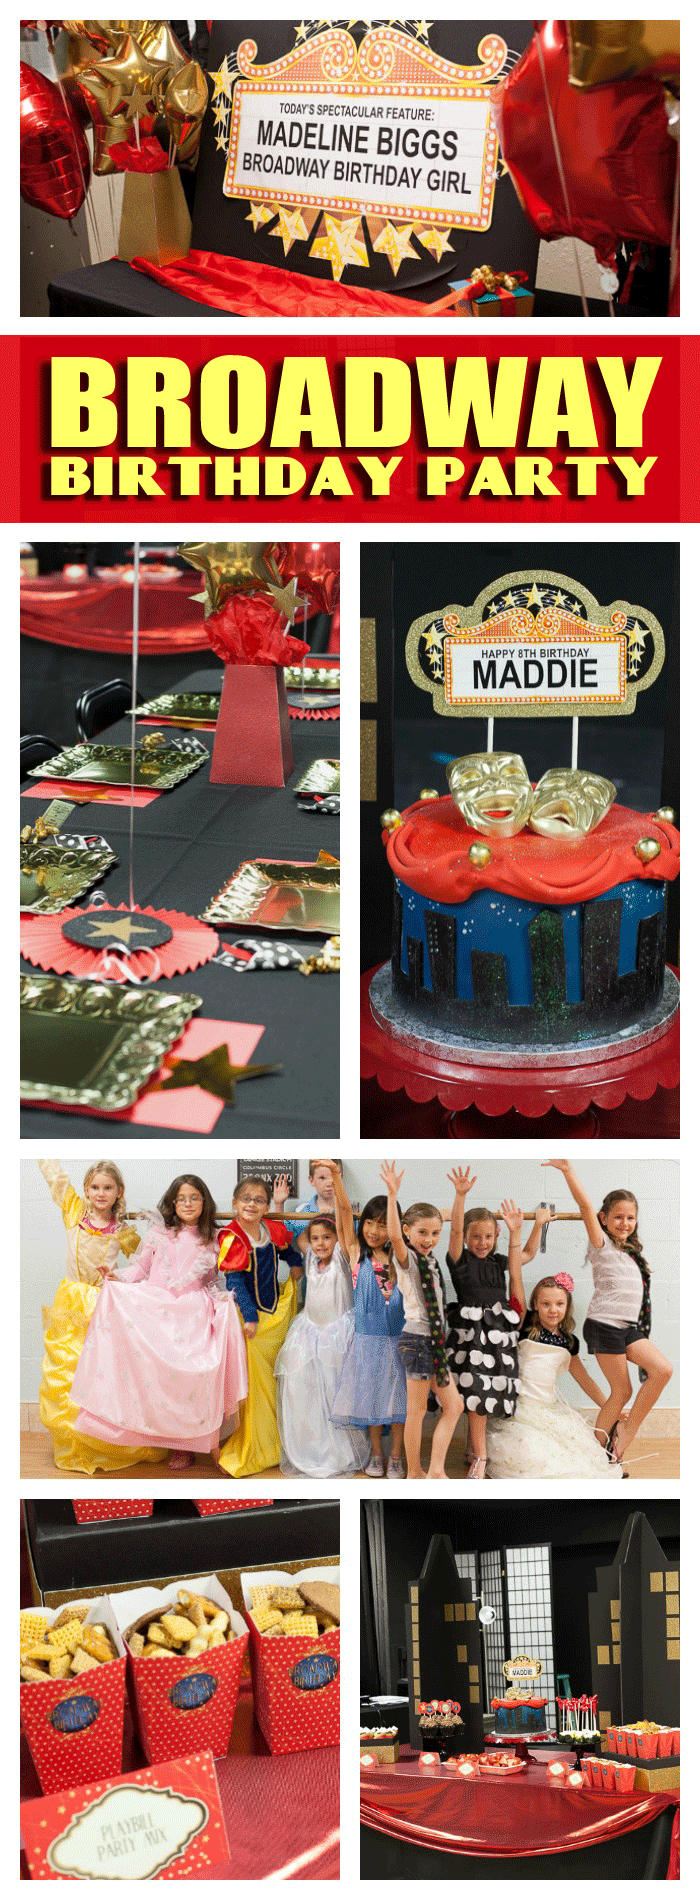 Broadway Birthday Party Ideas